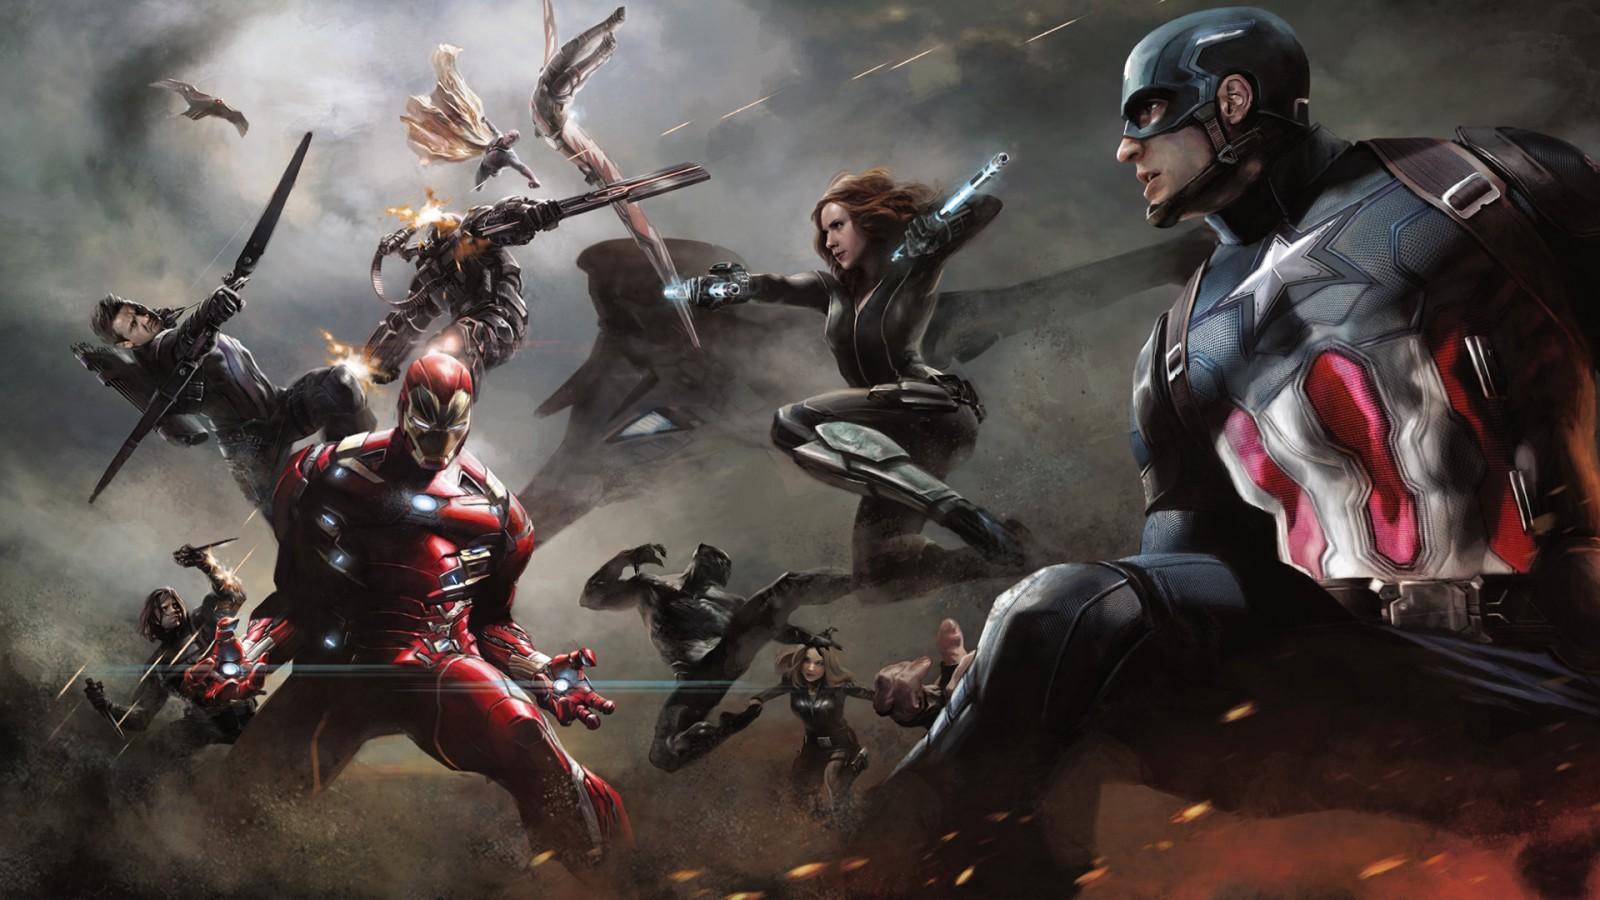 Hd Android Wallpapers 3d Captain America Civil War Artwork Wallpapers Hd